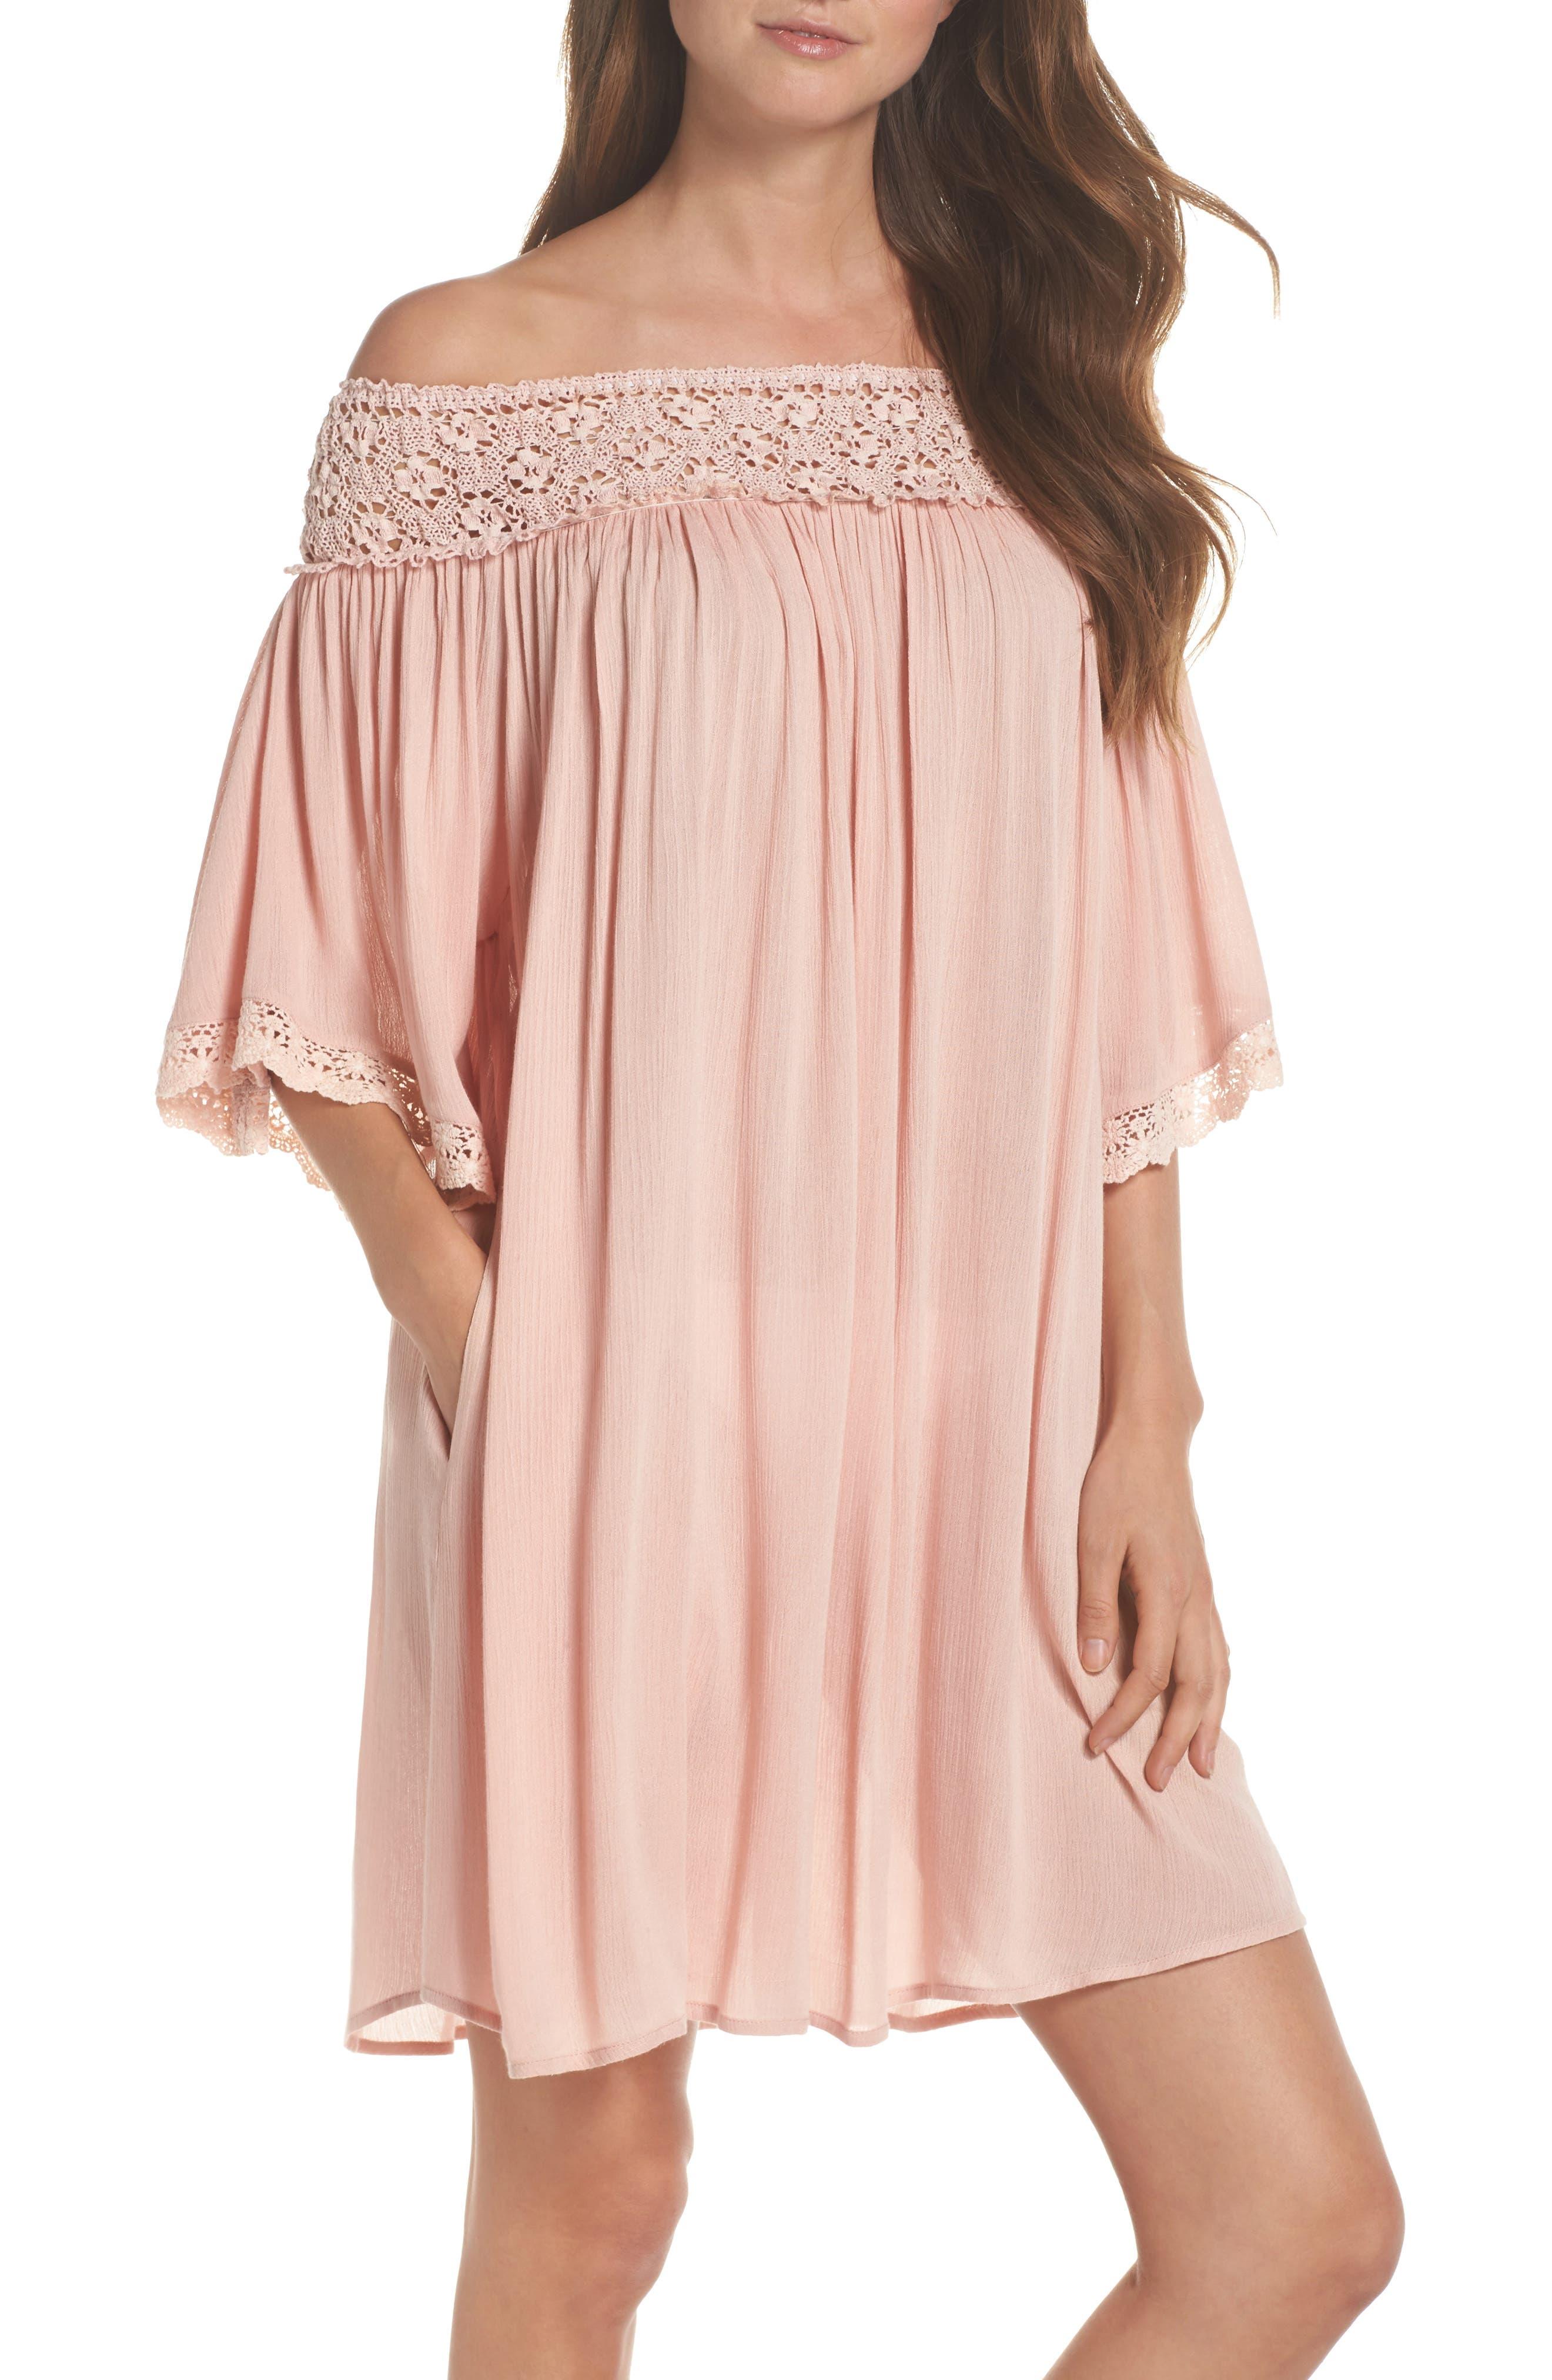 Muche et Muchette Rimini Crochet Cover-Up Dress